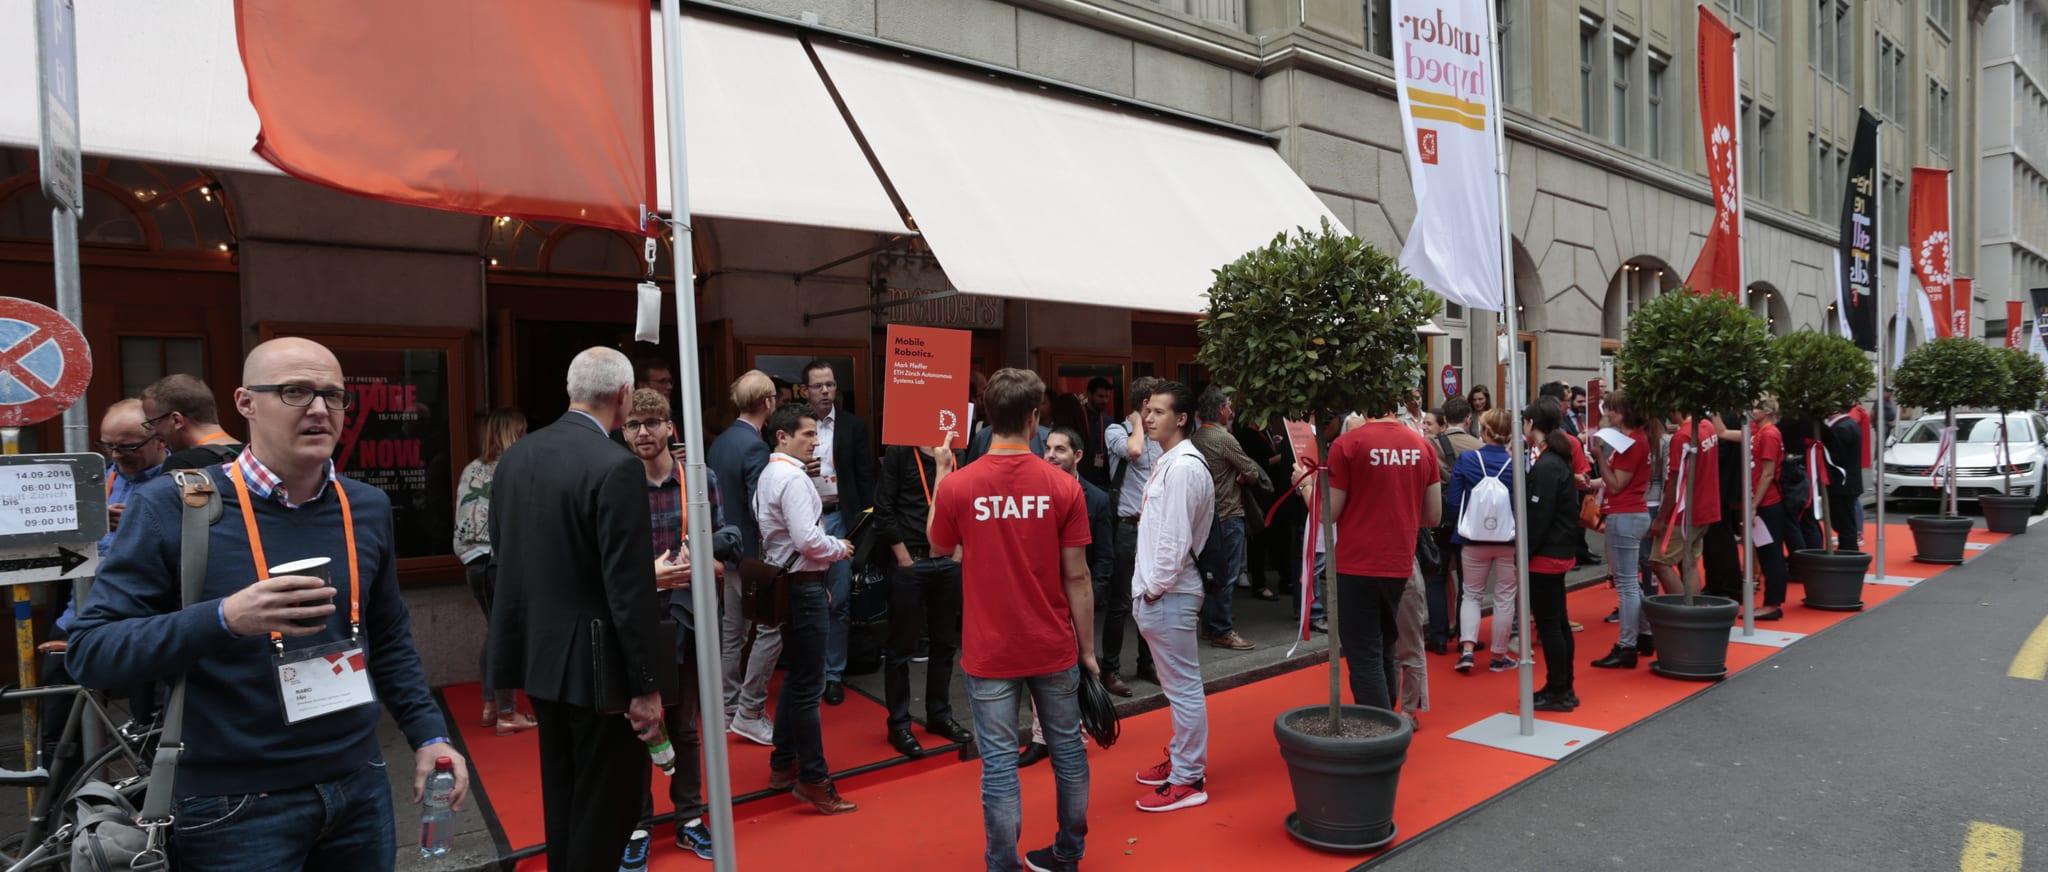 Digital Festival Zürich